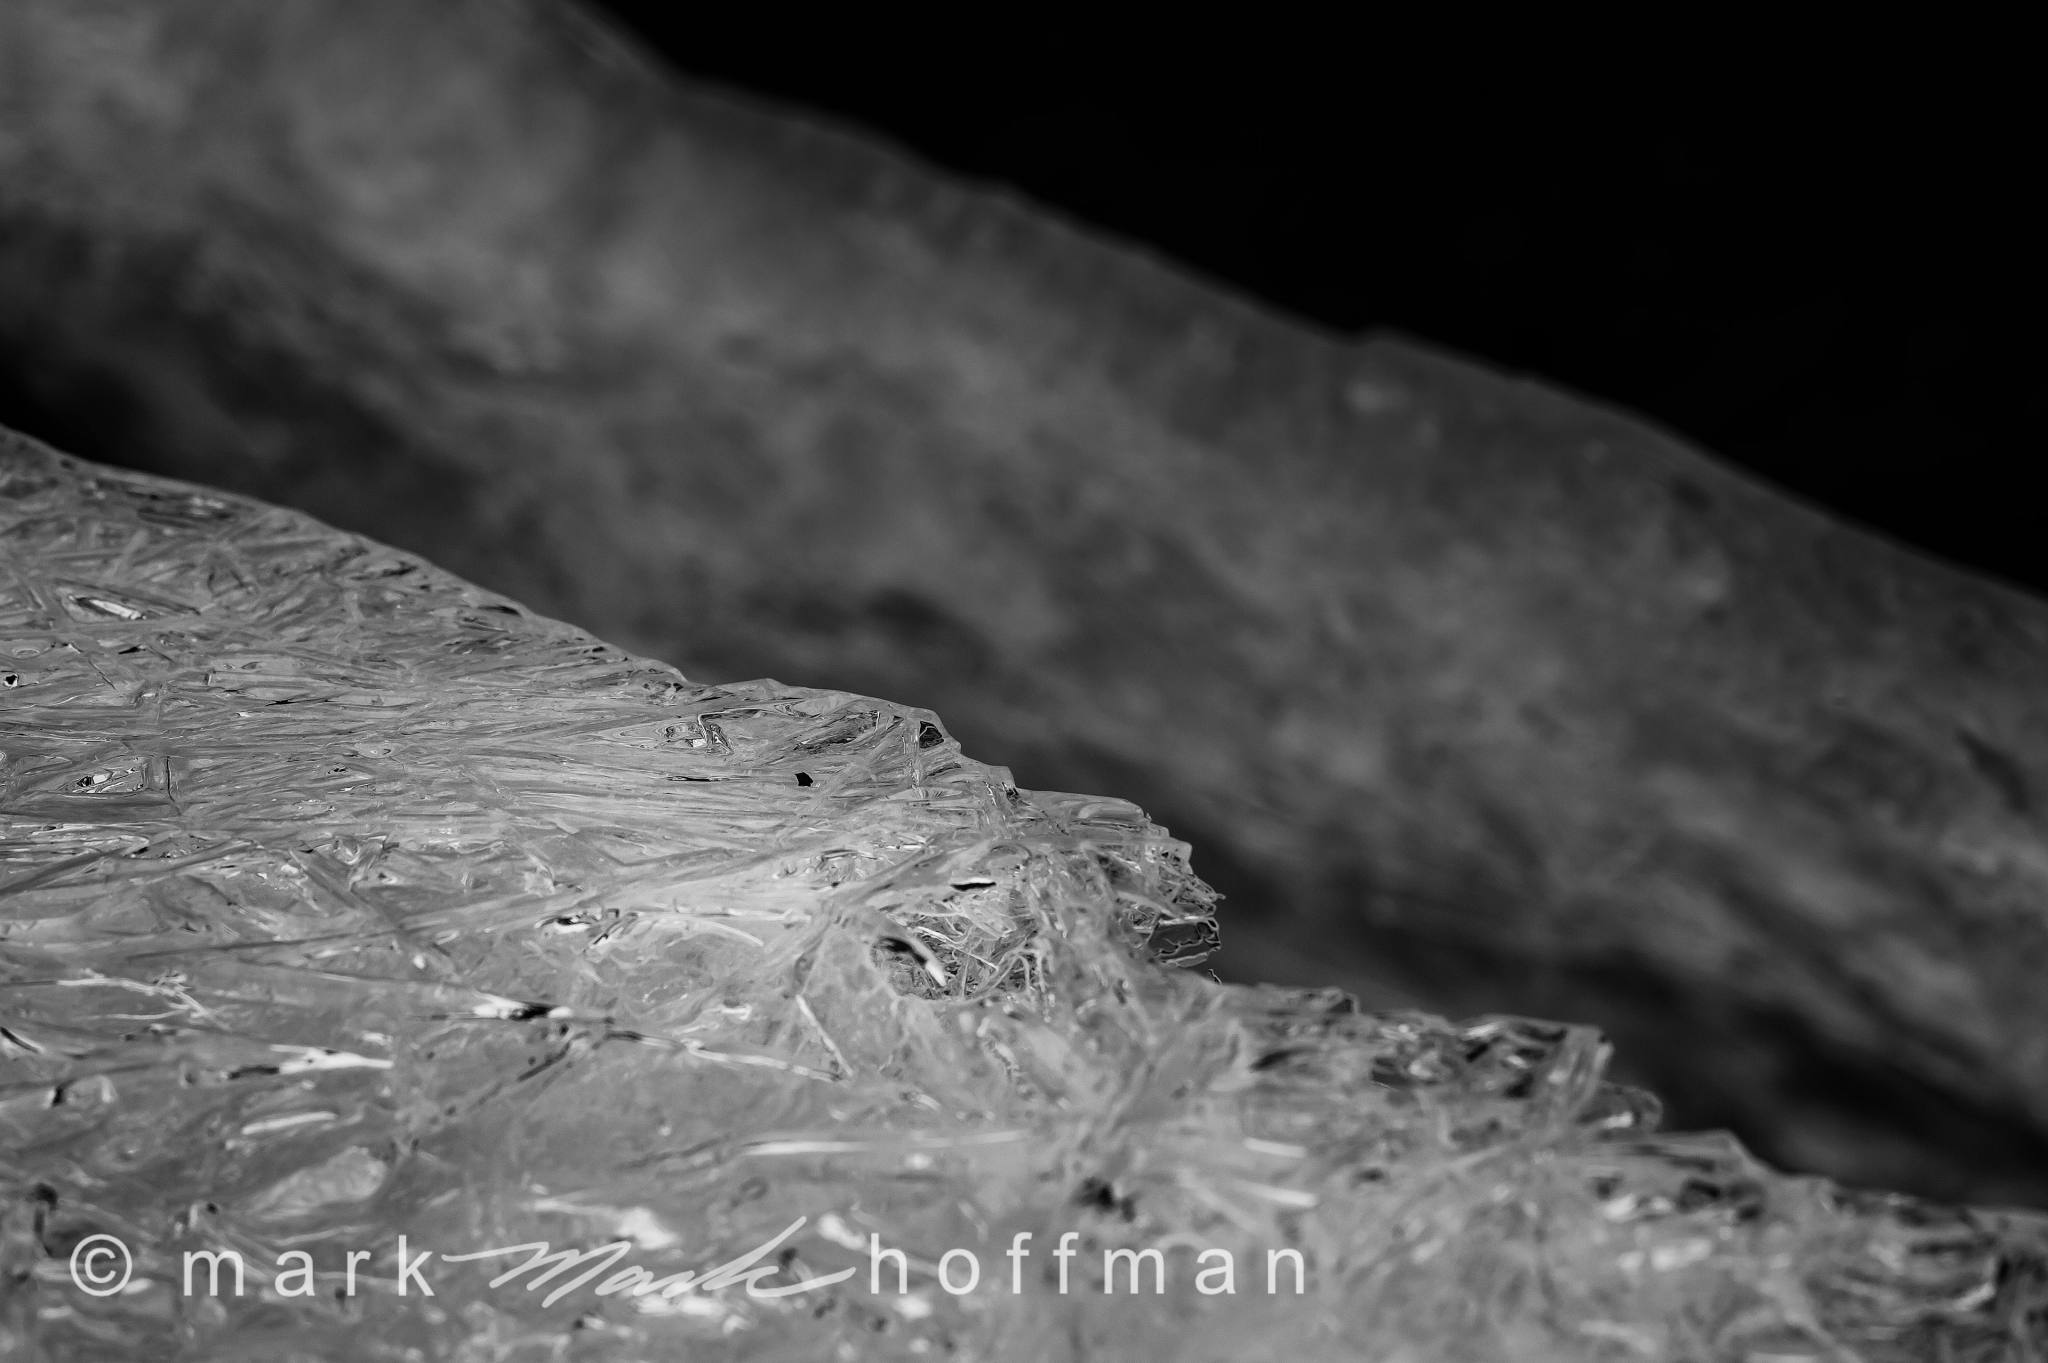 Mark_Hoffman_photophart_20160201_0073_Silv_DB_cap1_var1.jpg